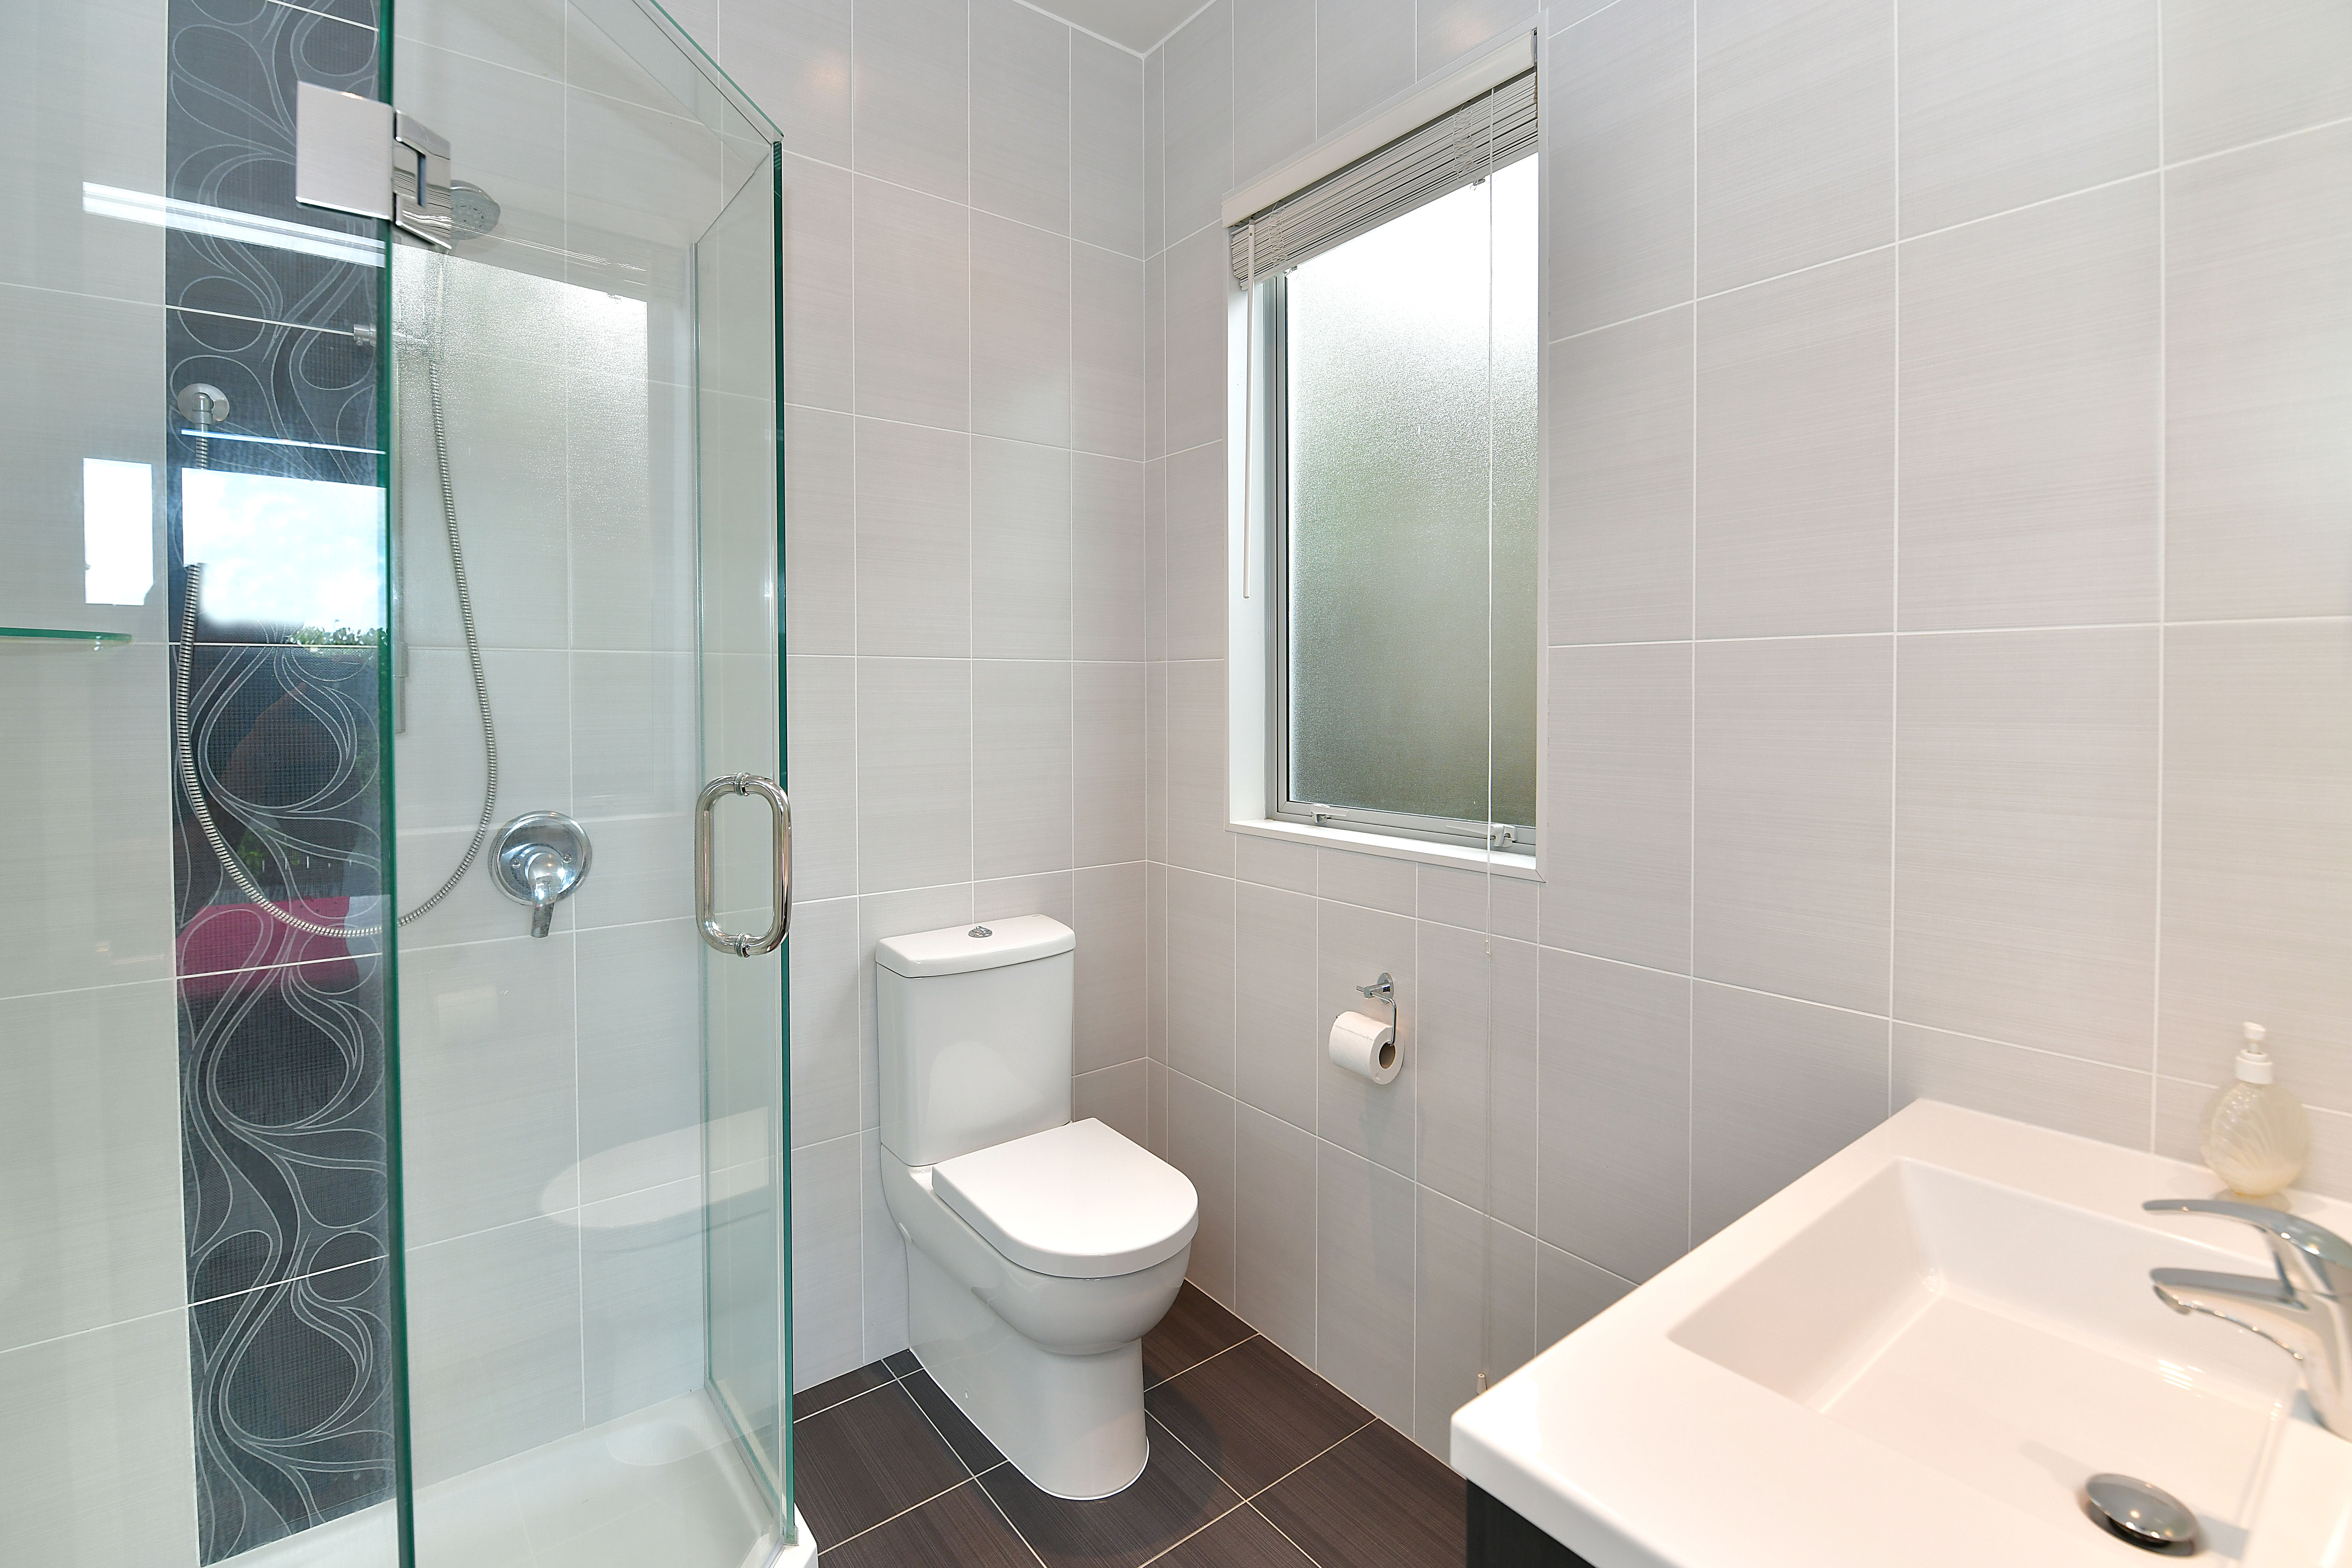 6 Galbraith Greens, Millwater, Rodney | Mike Pero Real Estate